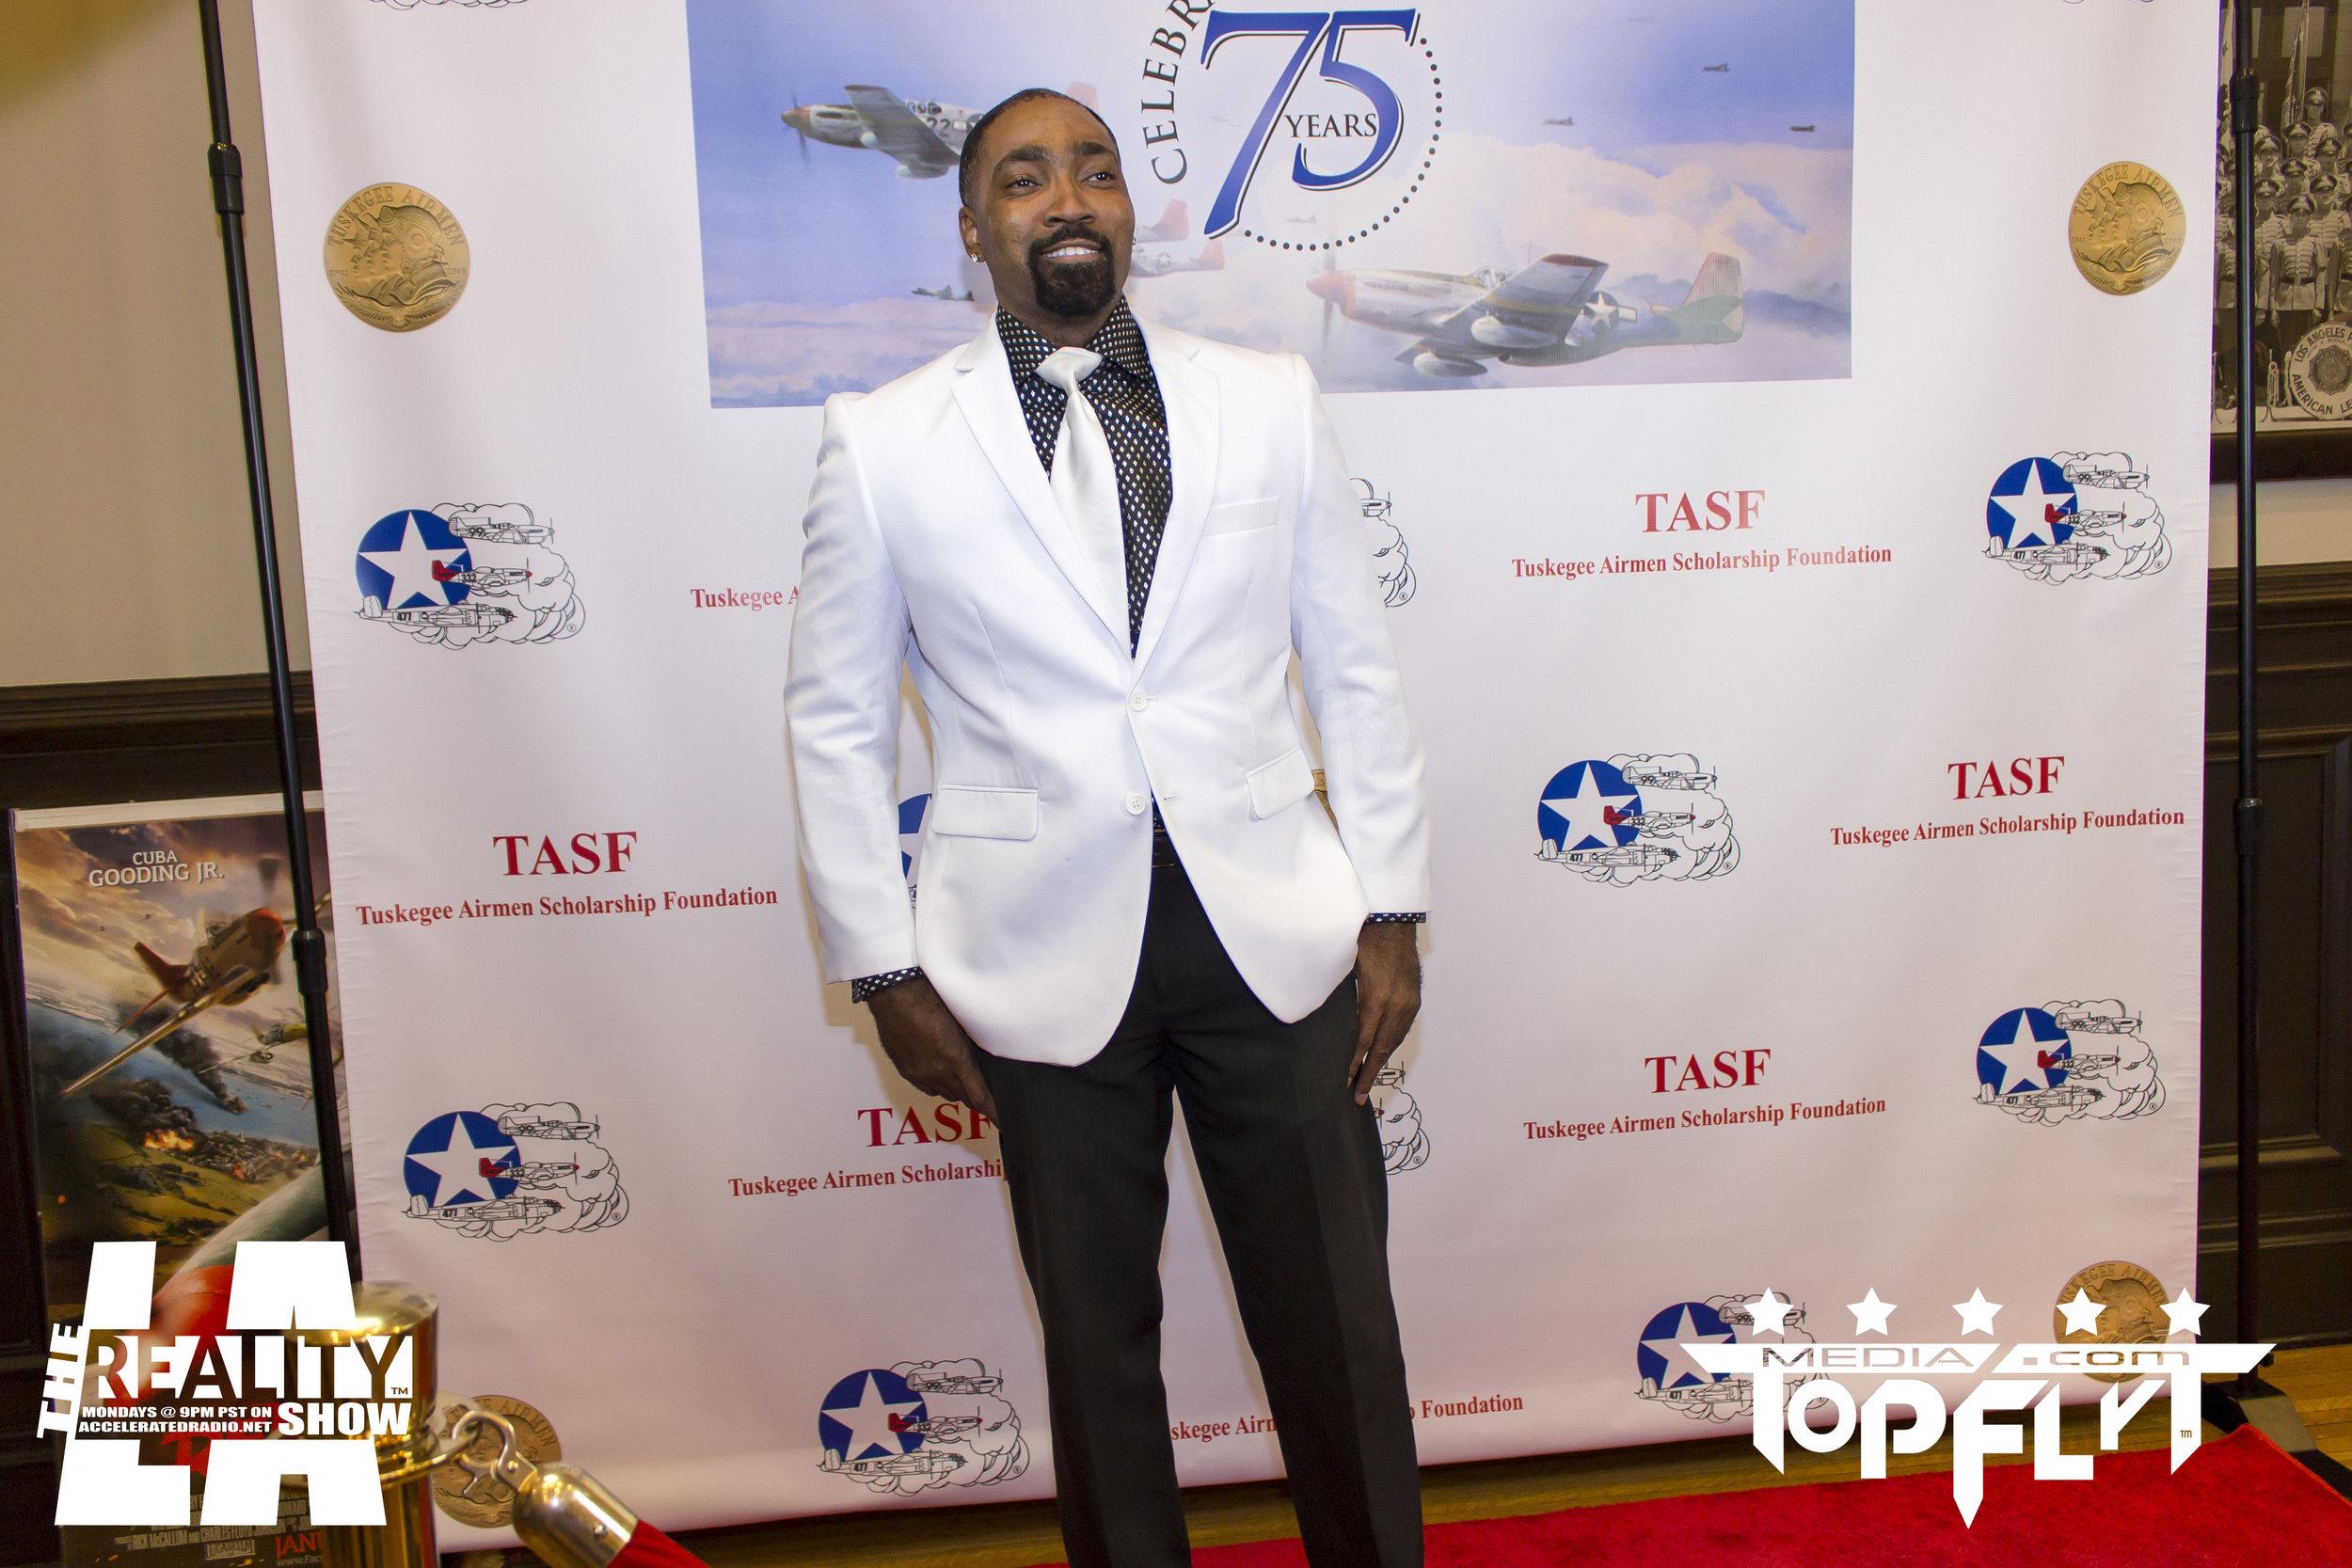 The Reality Show LA - Tuskegee Airmen 75th Anniversary VIP Reception_34.jpg